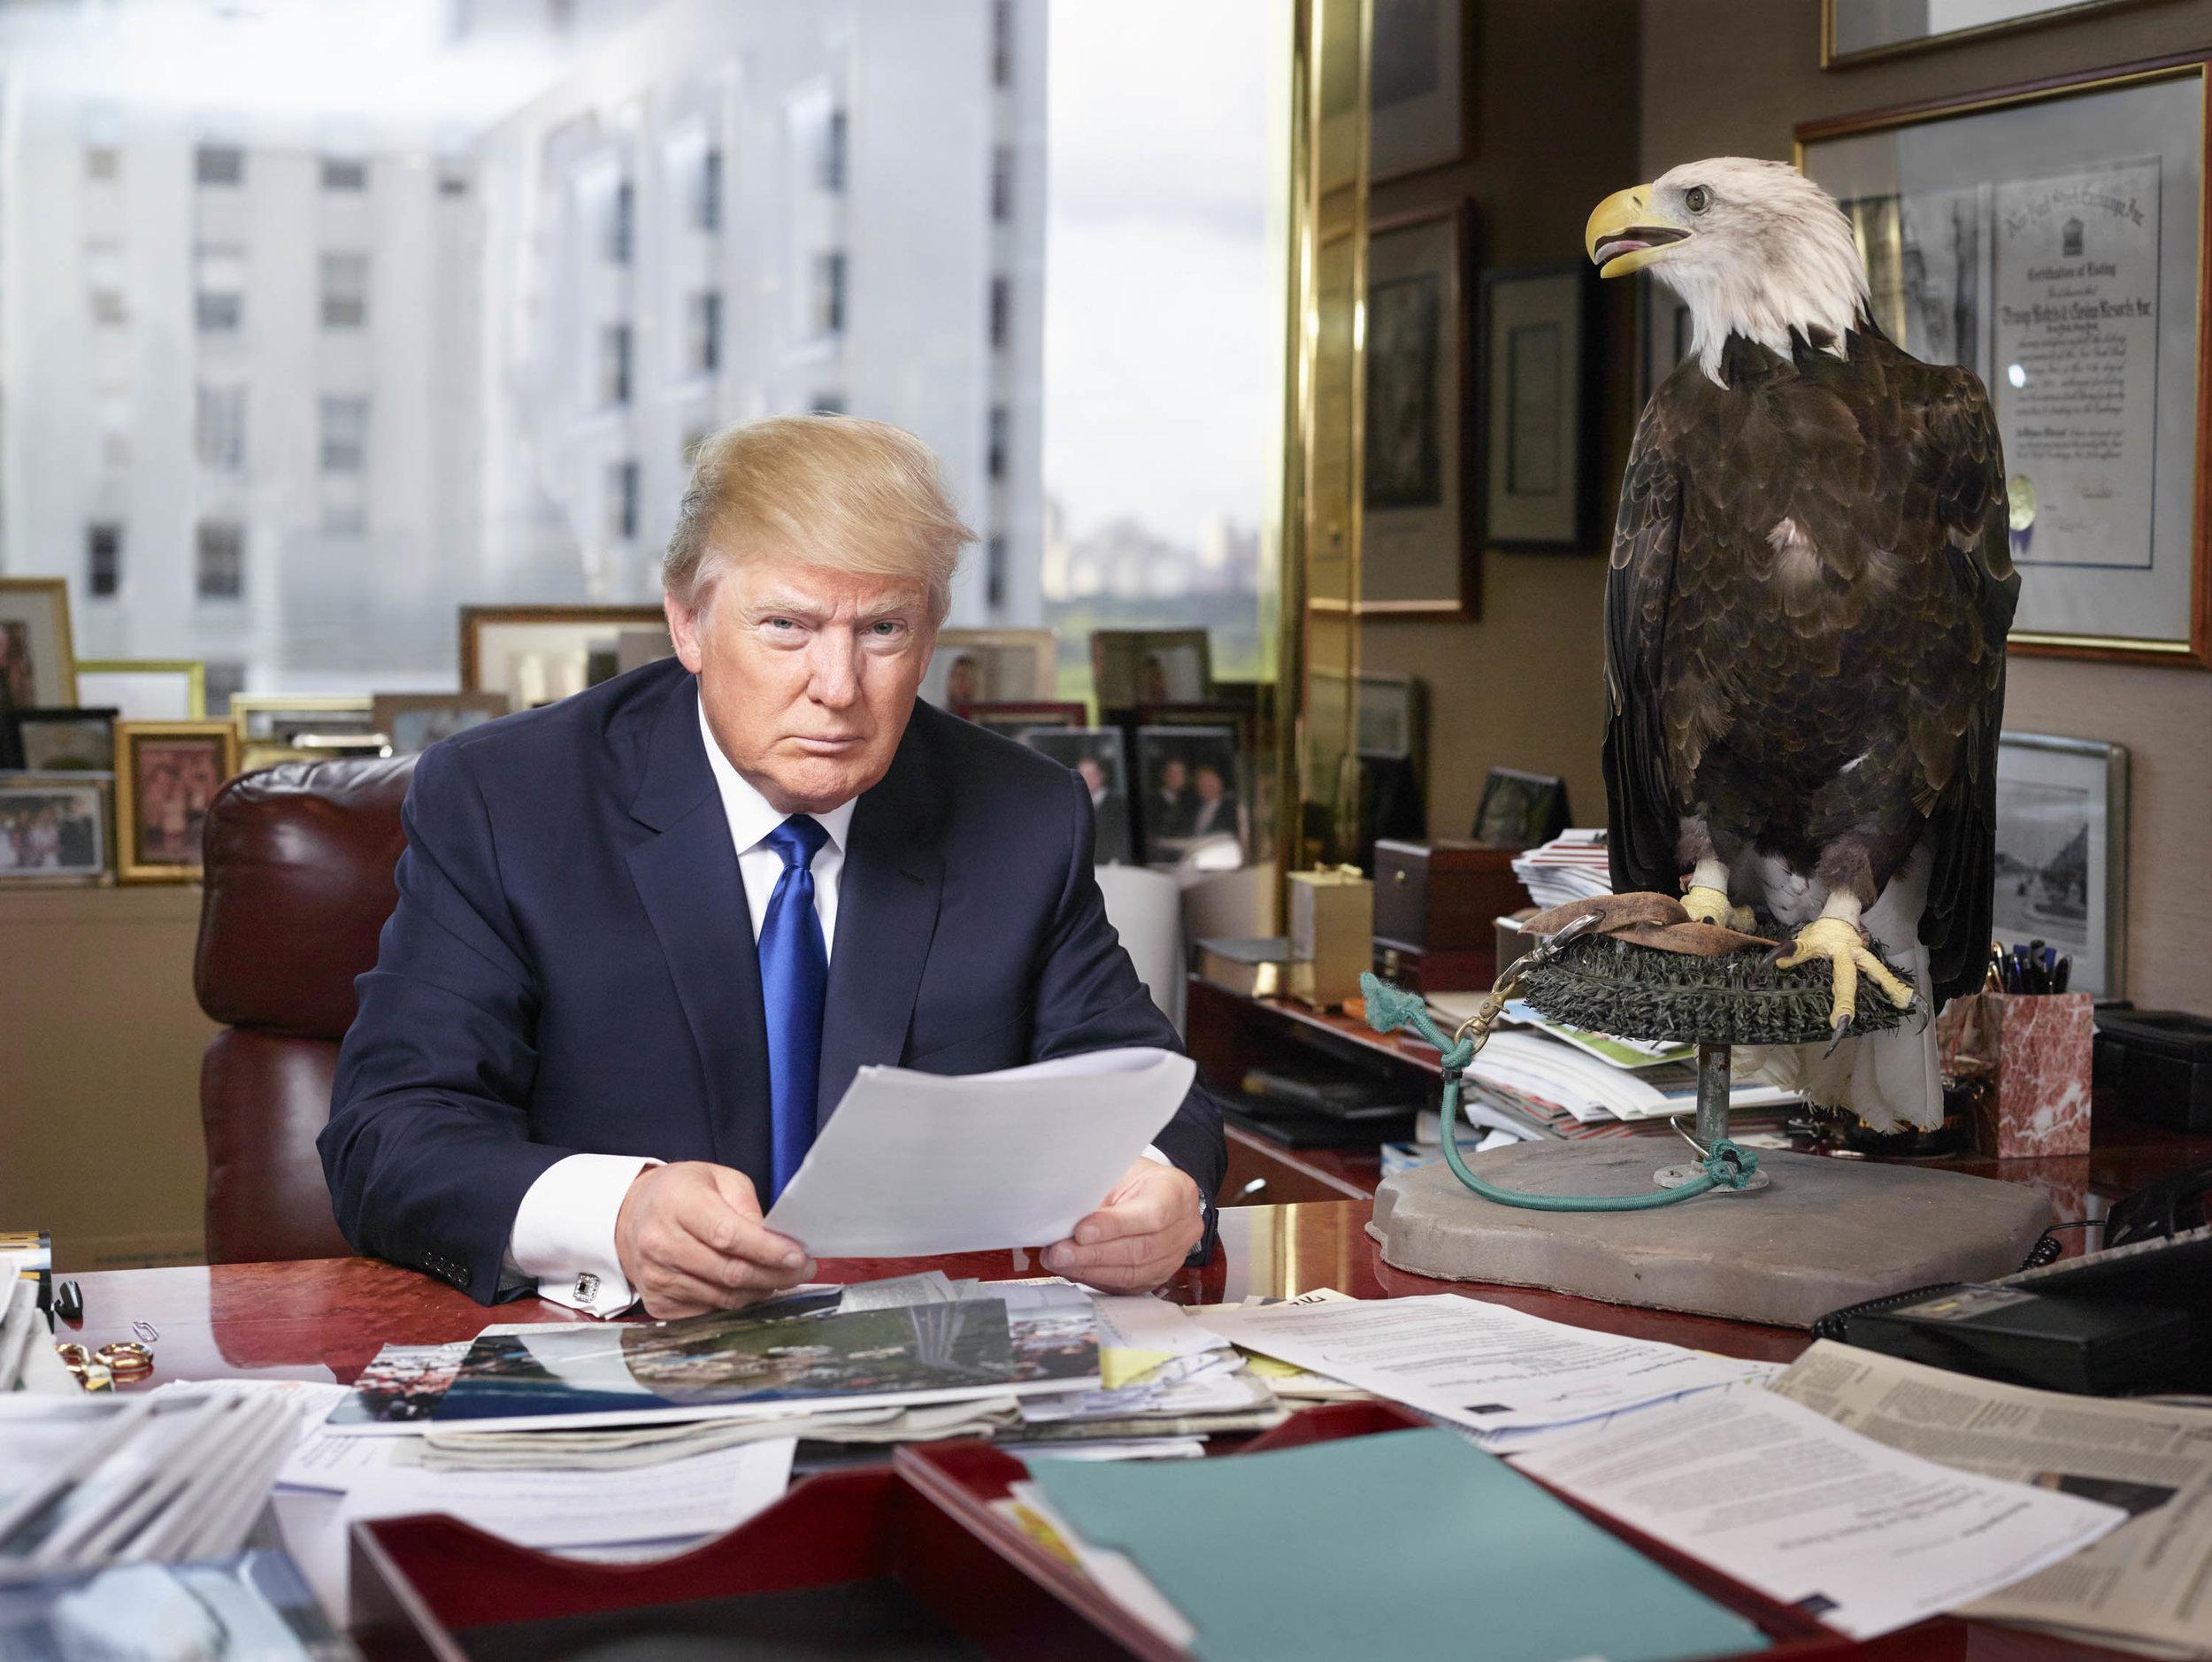 trump-campaign-politics-sideshow.jpg